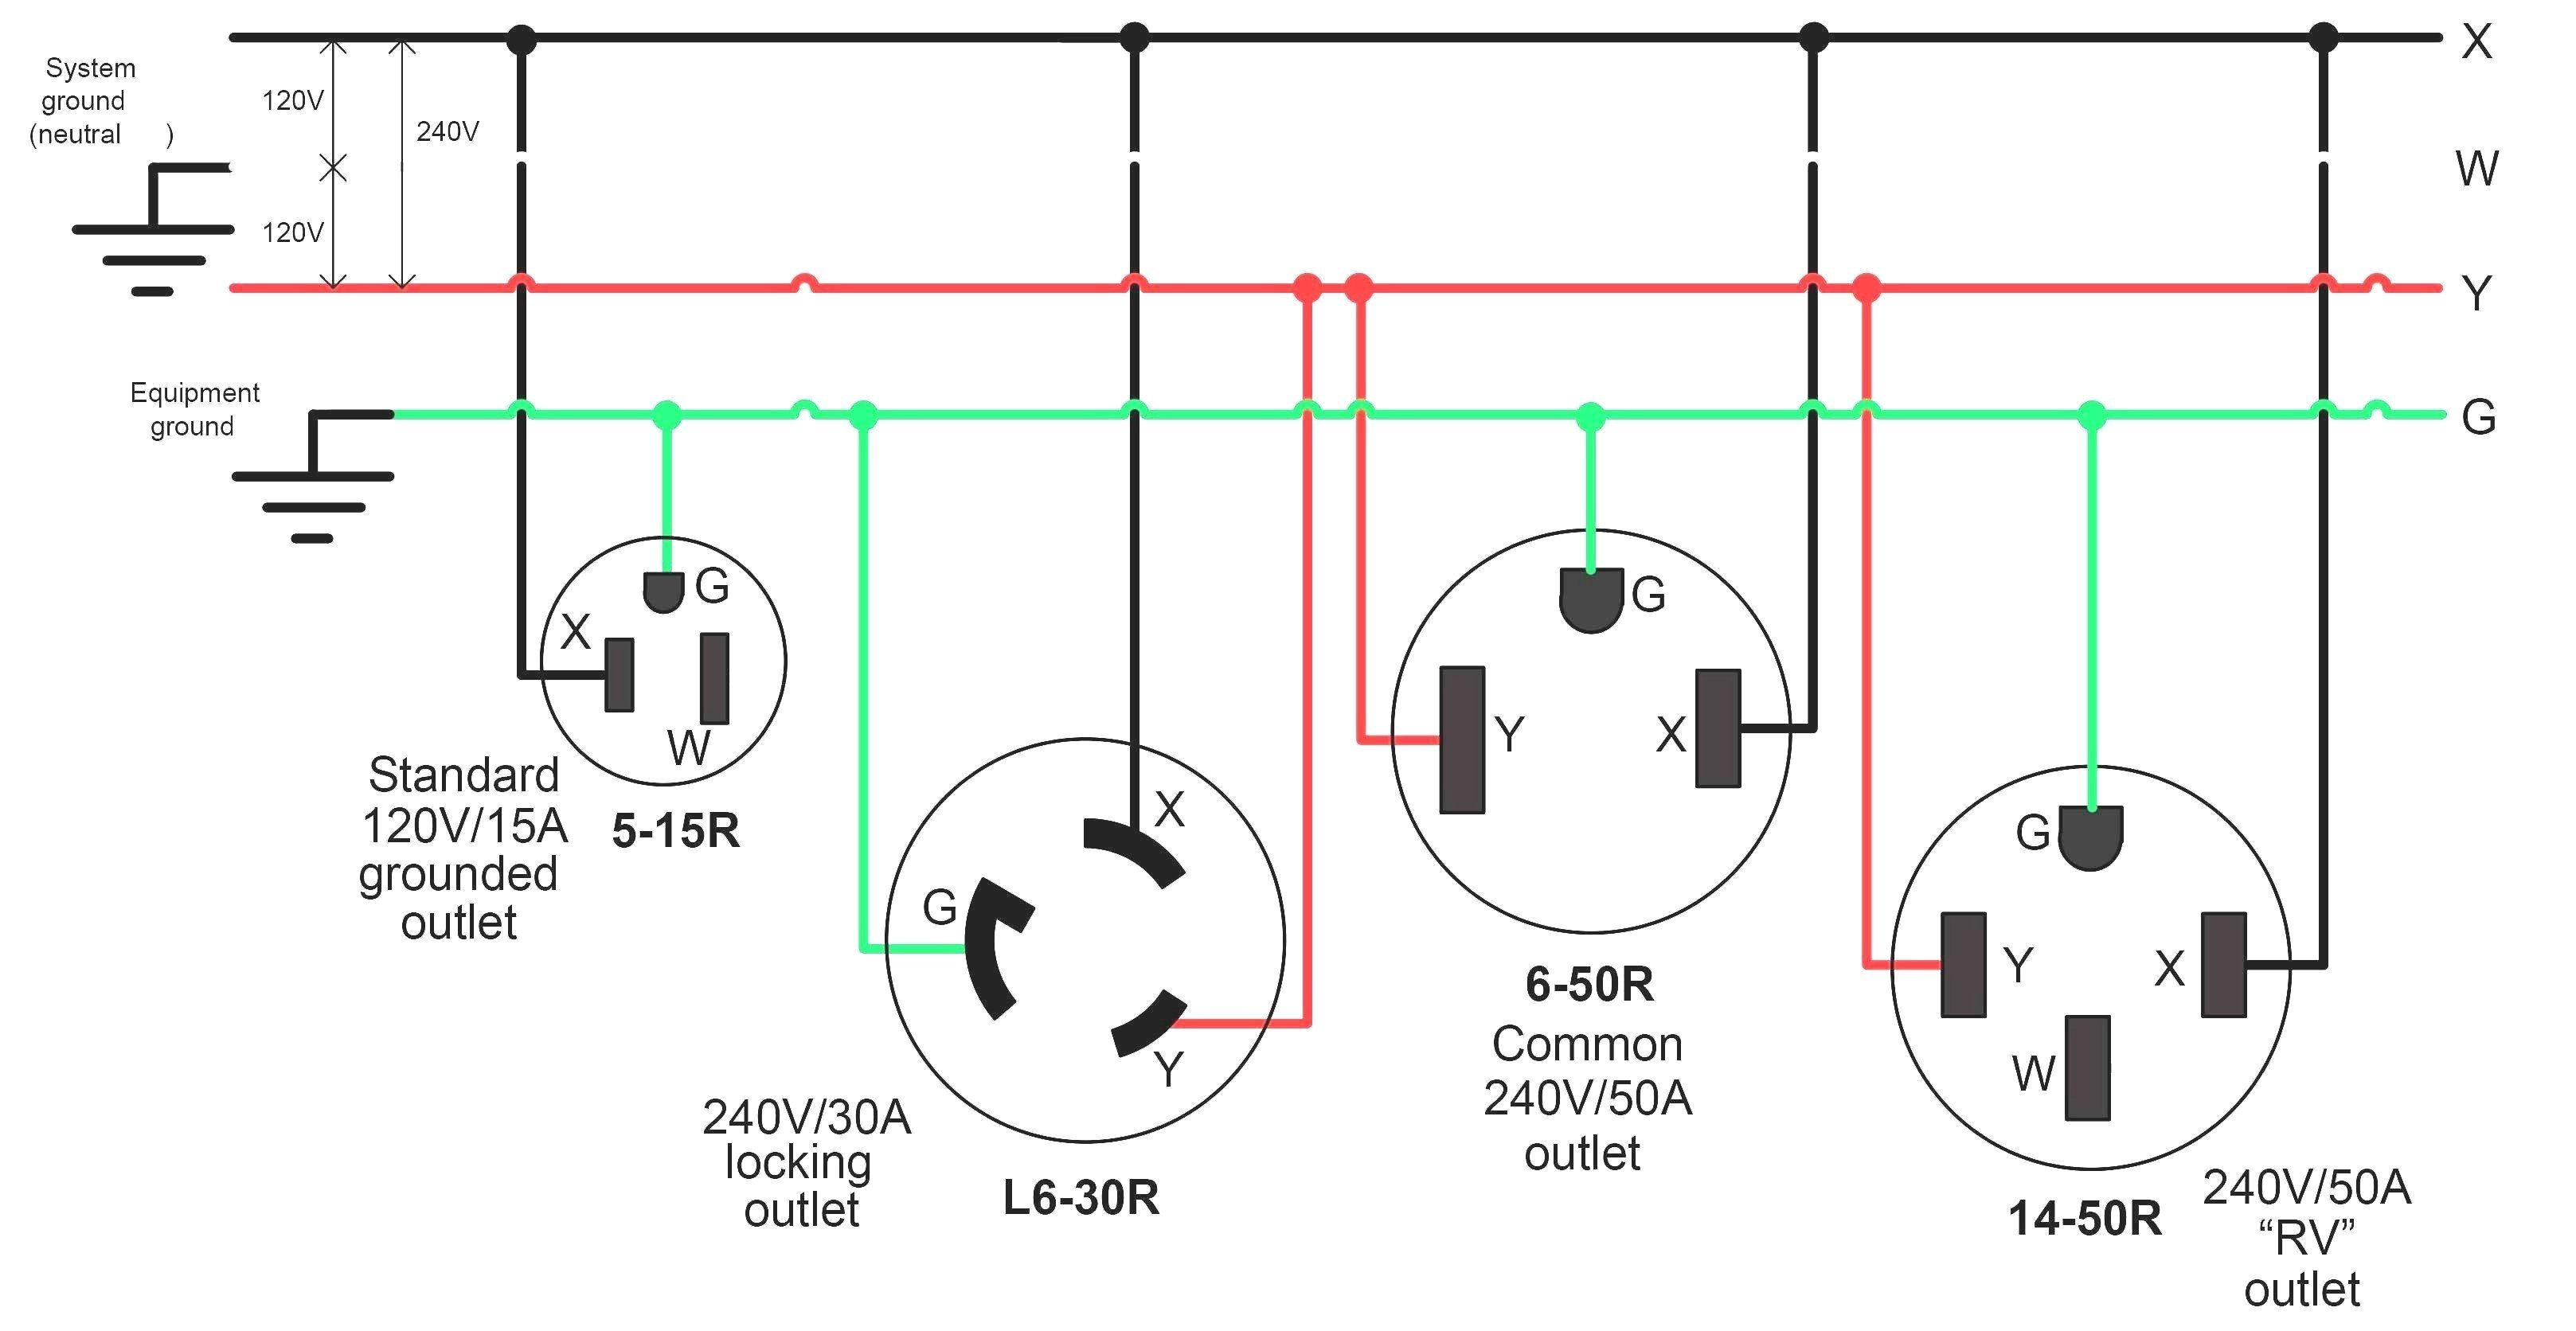 wire diagram l15 20r receptacle wiring diagram usedwire diagram l15 20r receptacle wiring diagram today nema